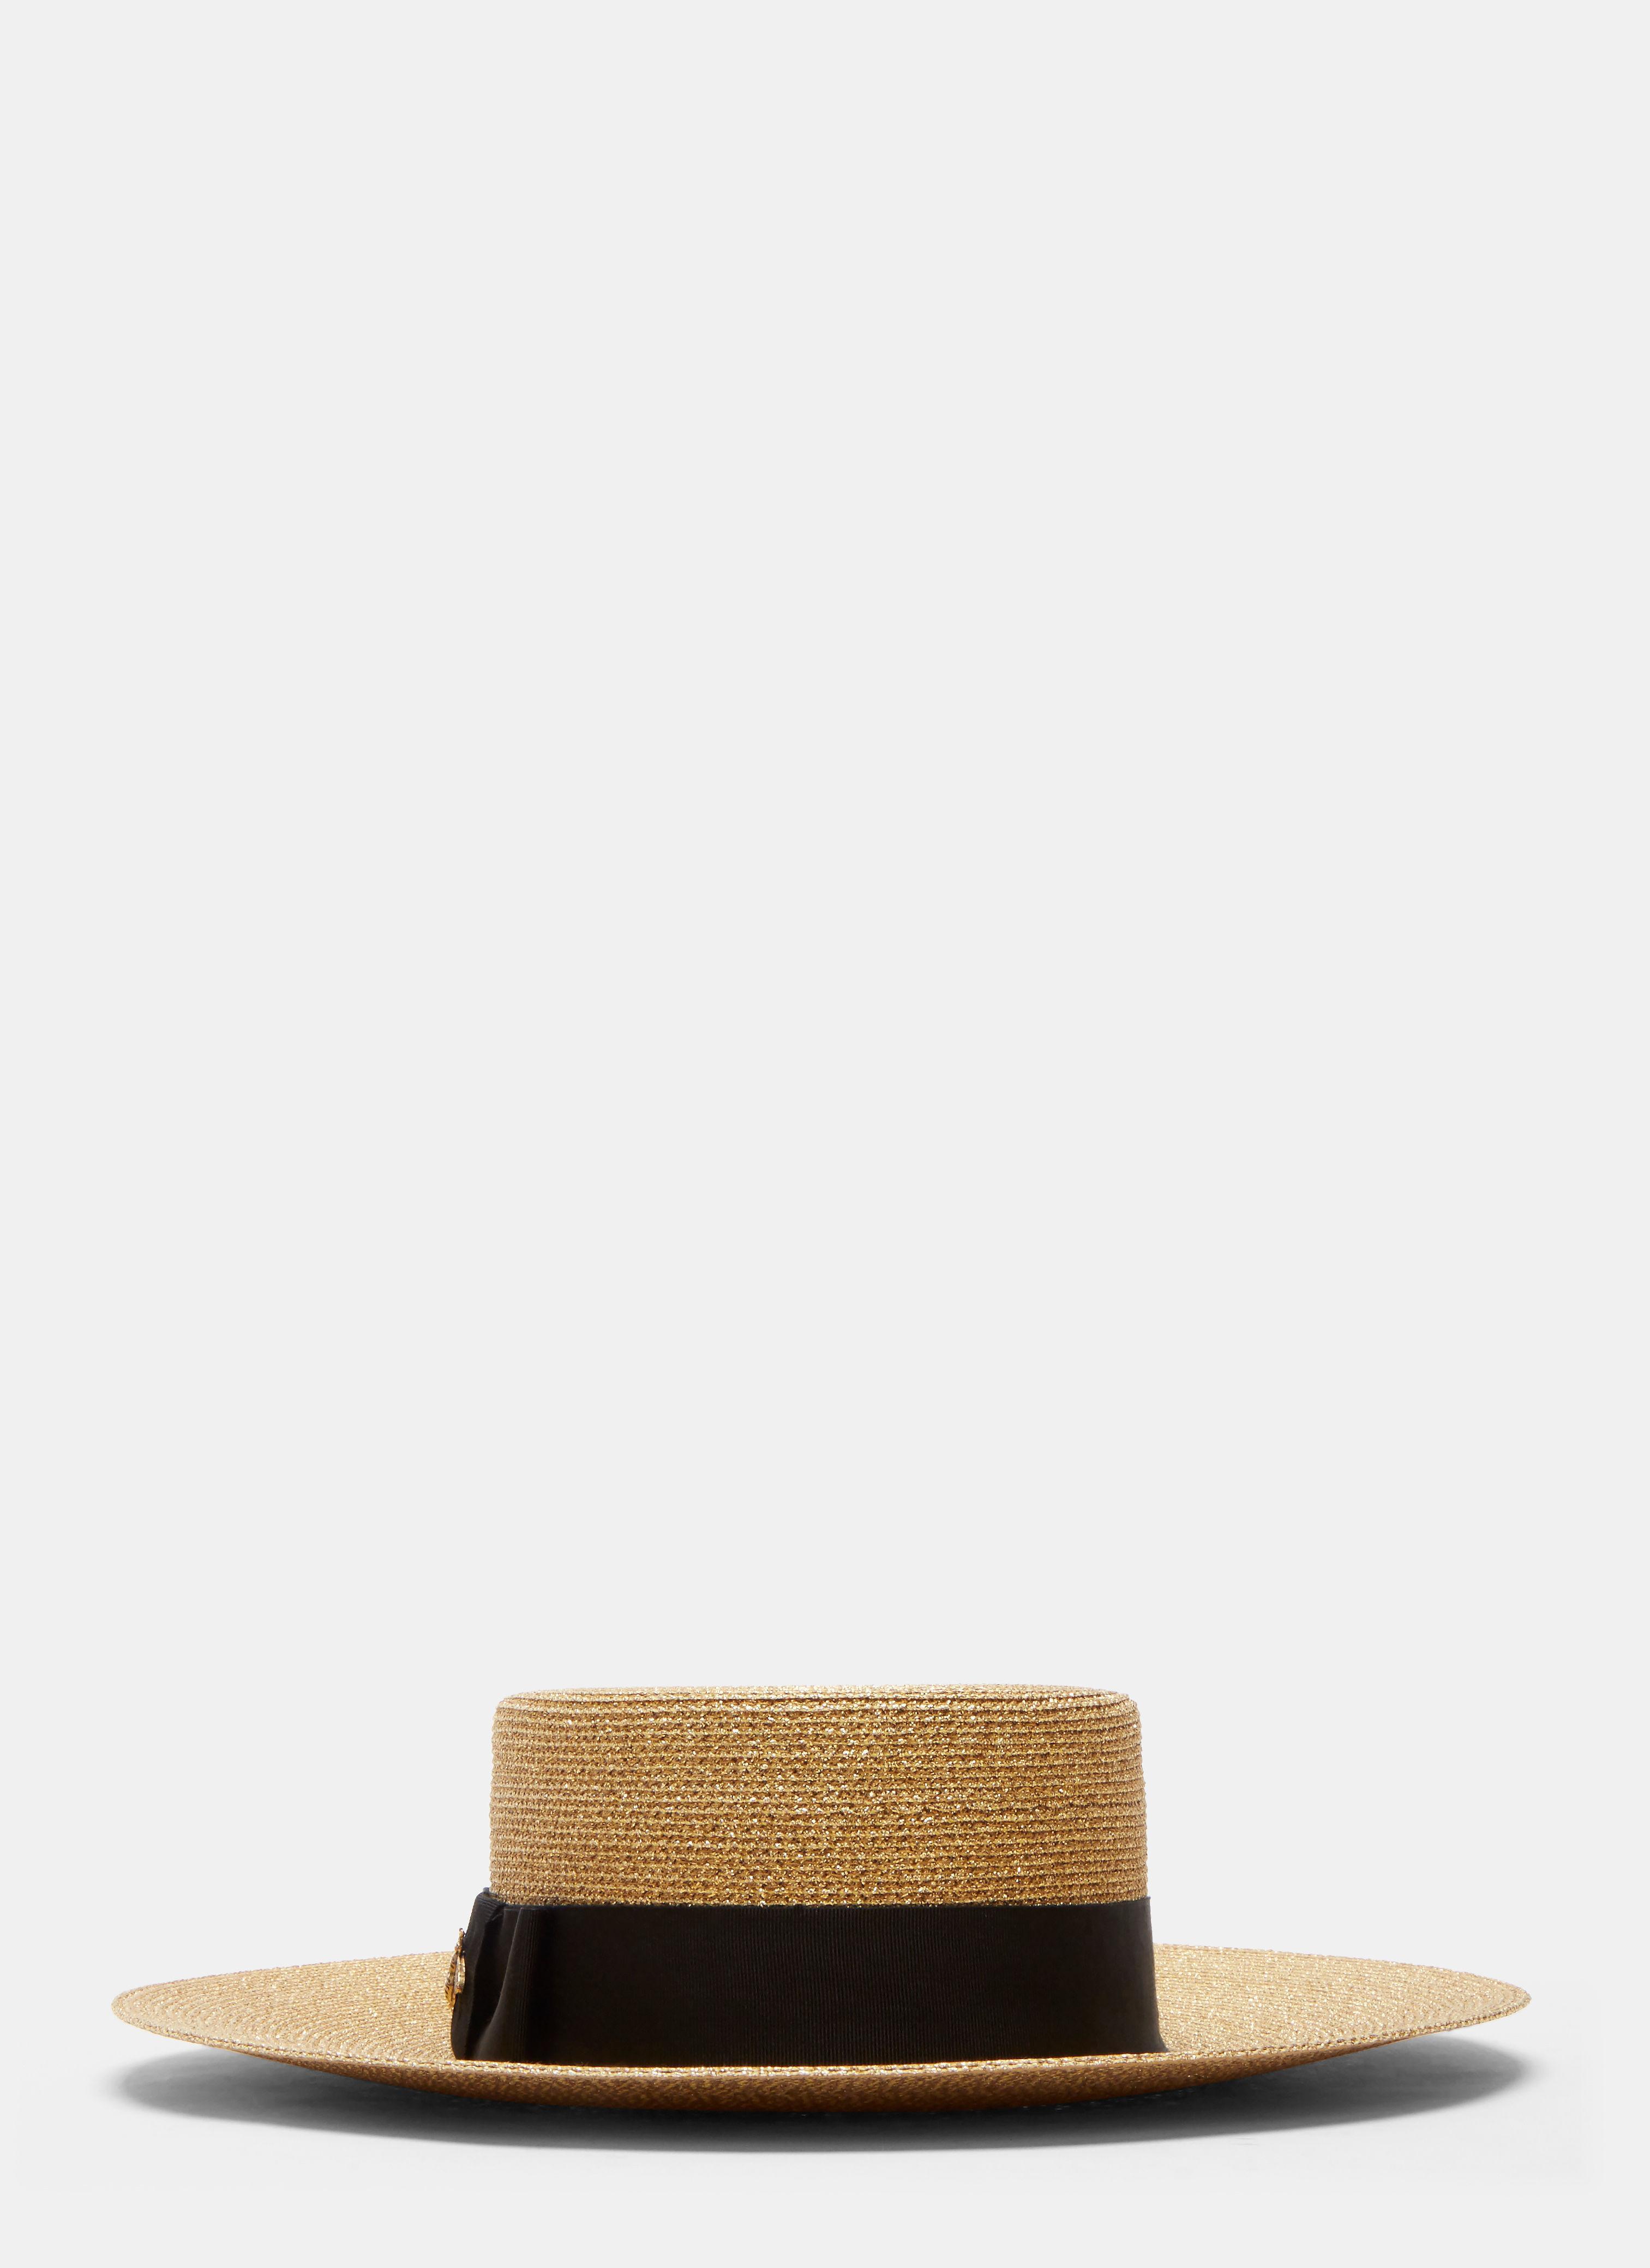 Gucci Women s Alba Lurex Papier Hat In Gold in Metallic - Lyst 3467e2d26f13